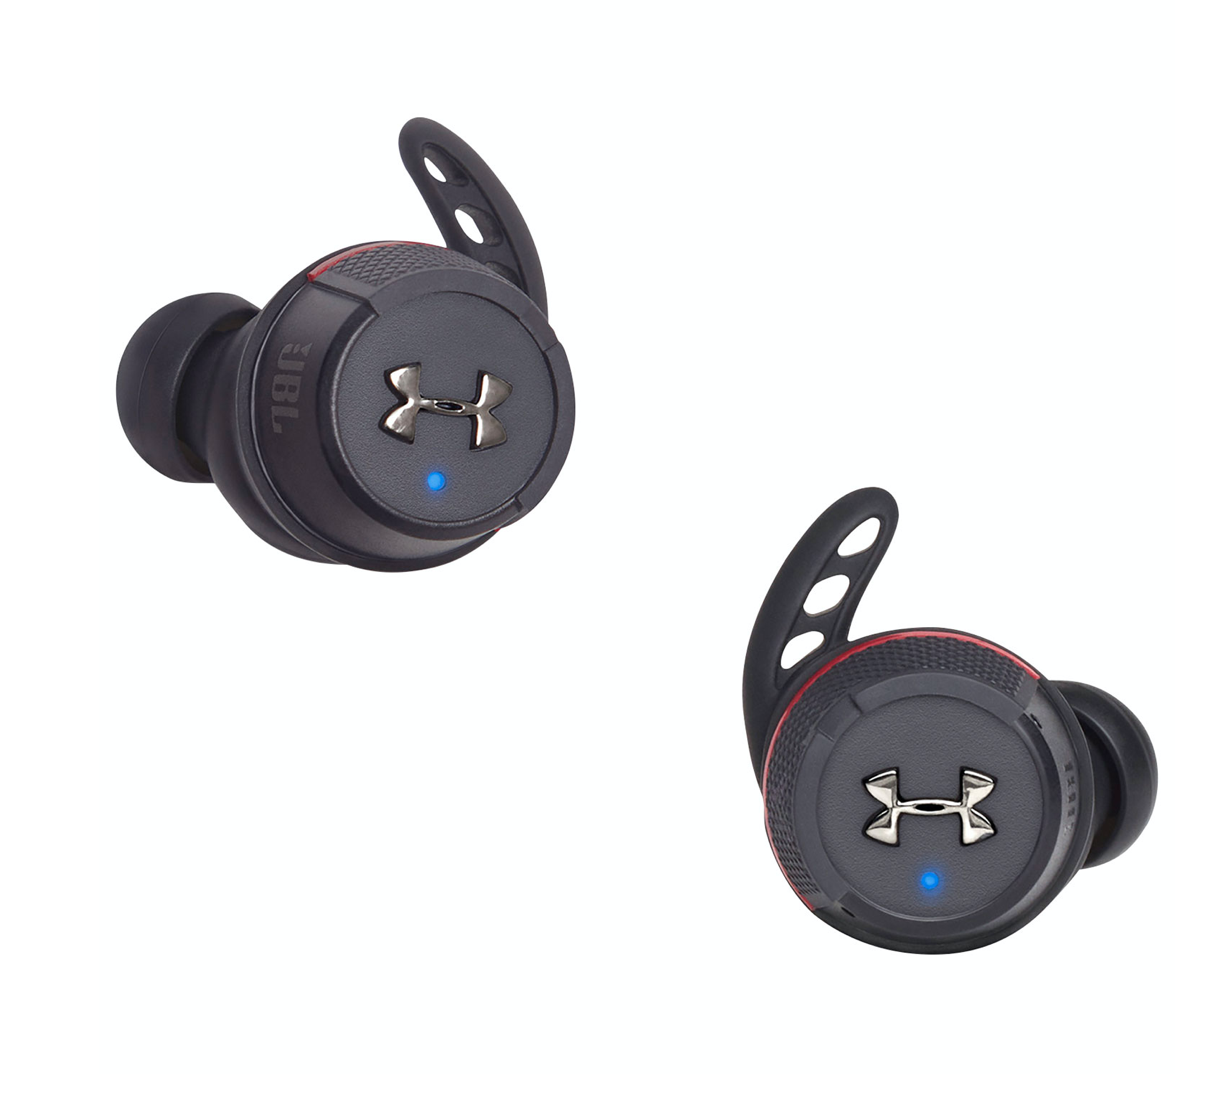 JBL Under Armour true wireless sports earbuds